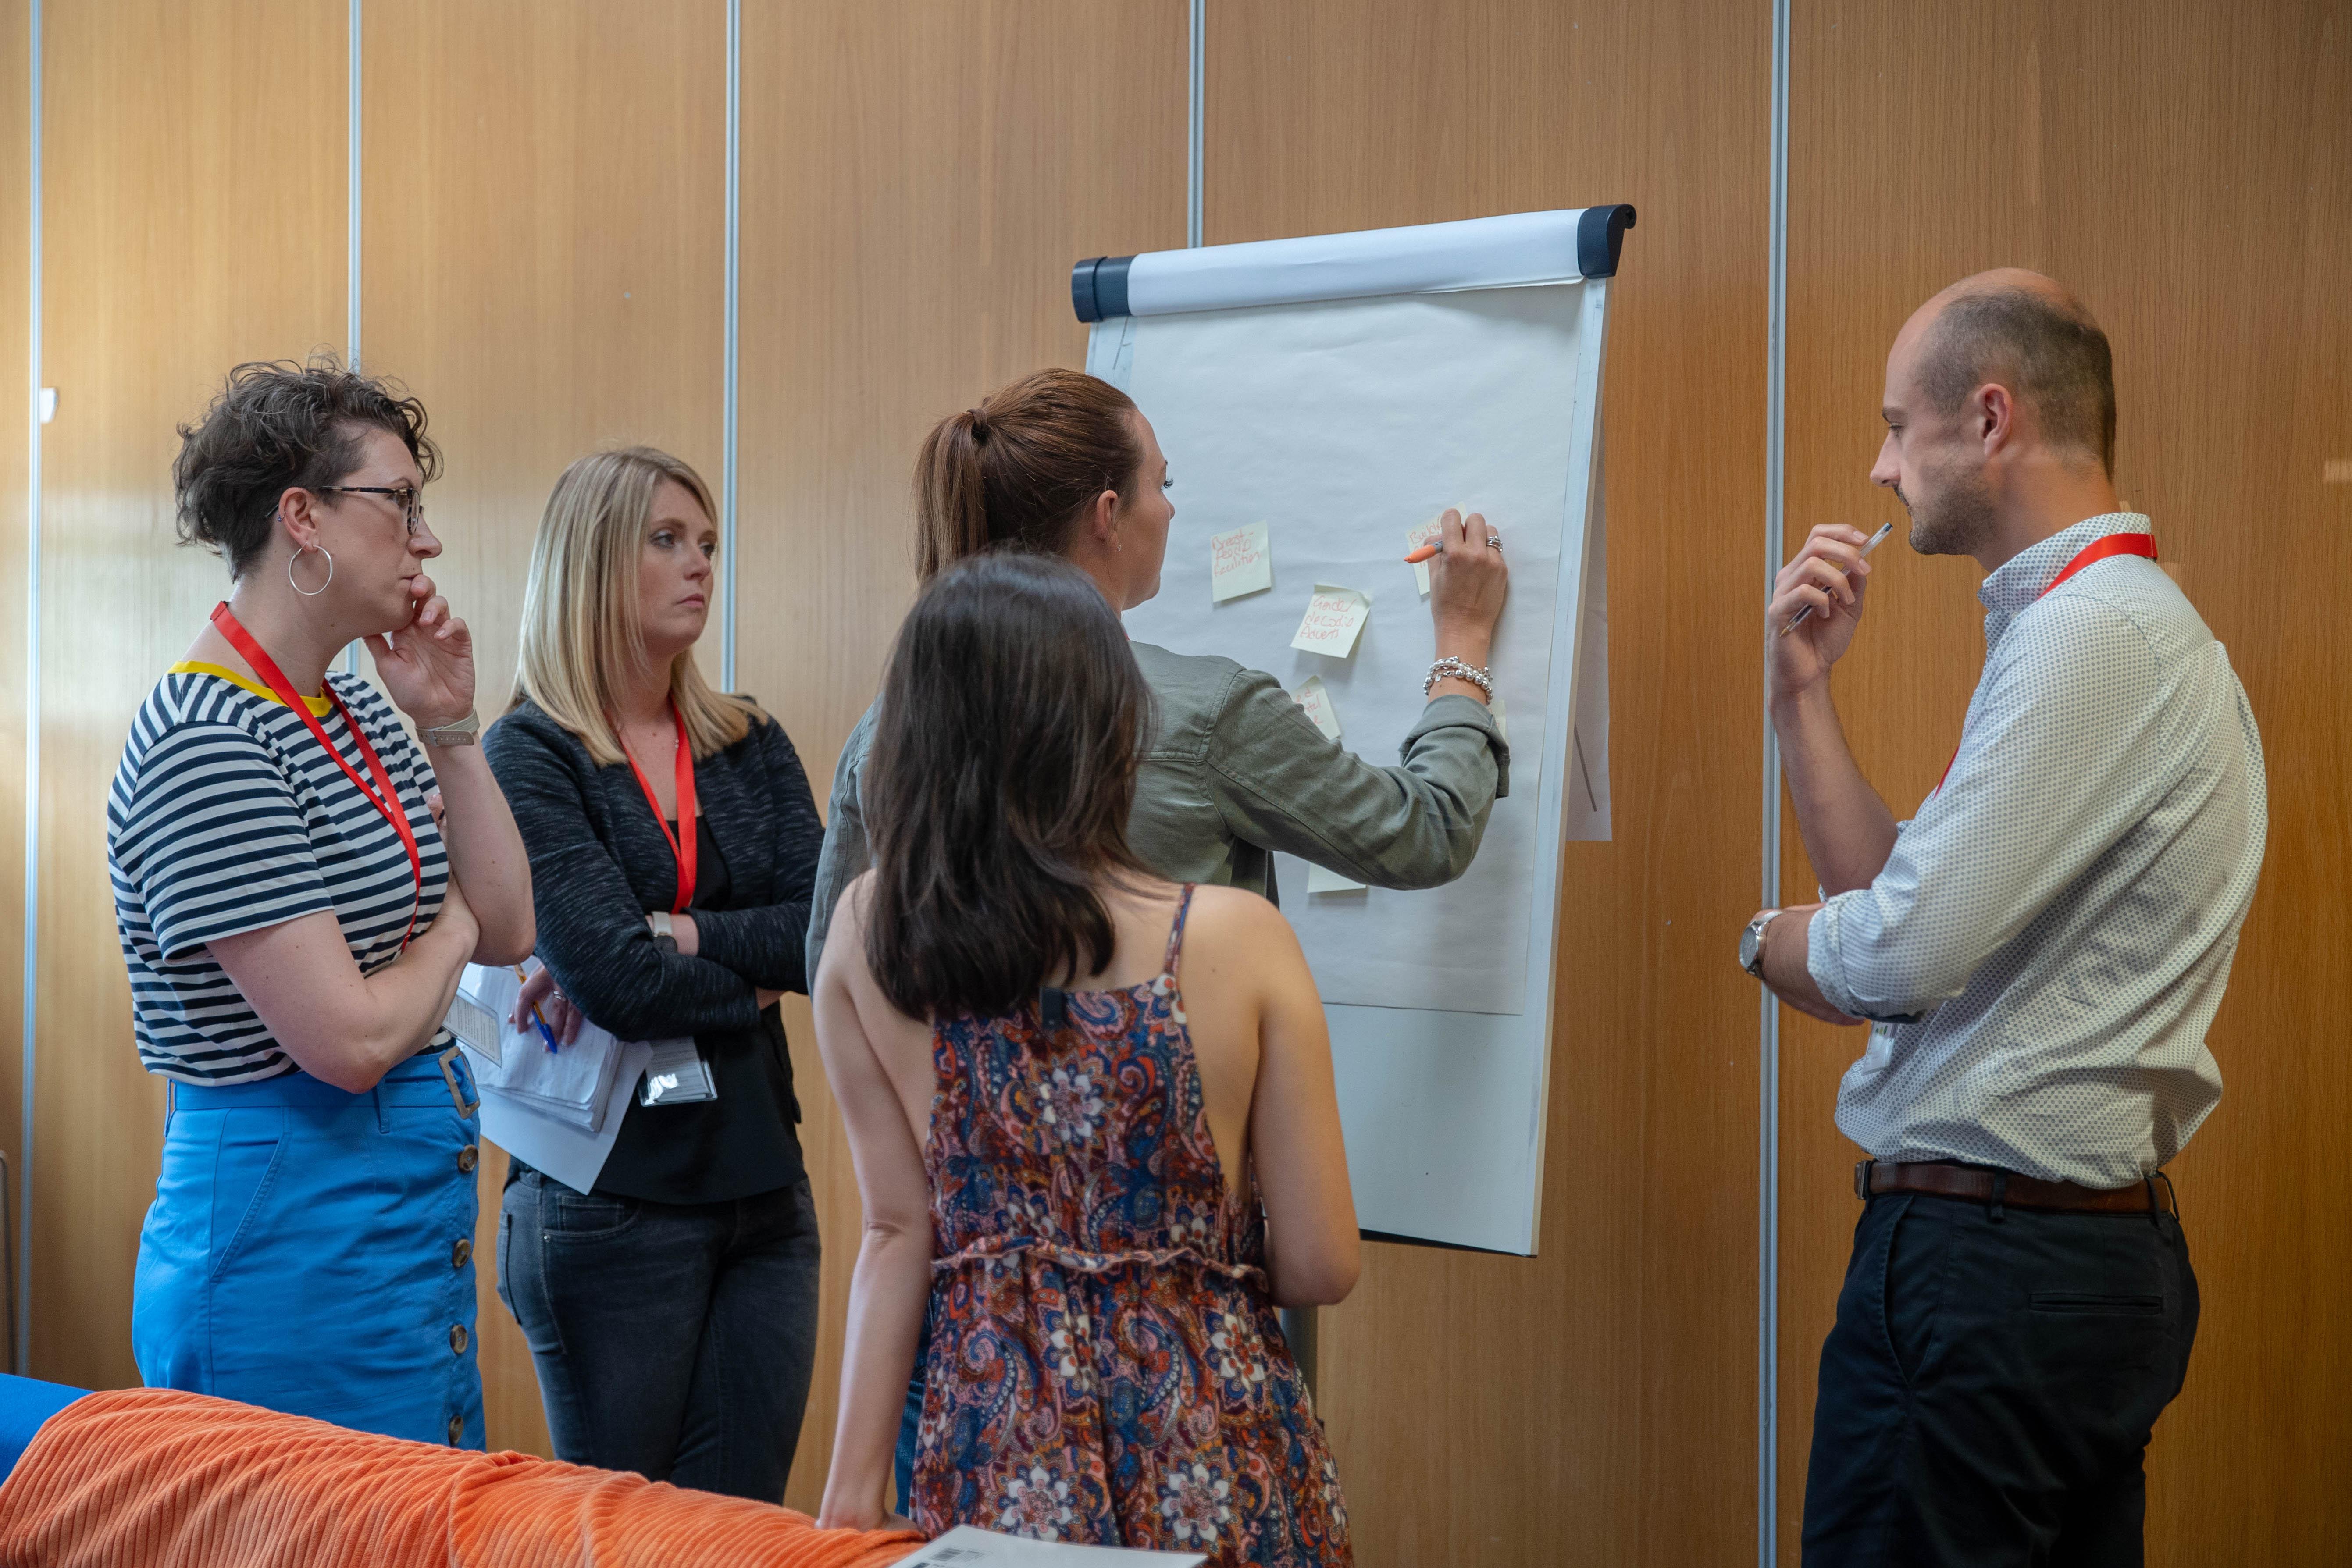 Members taking part in the workshop